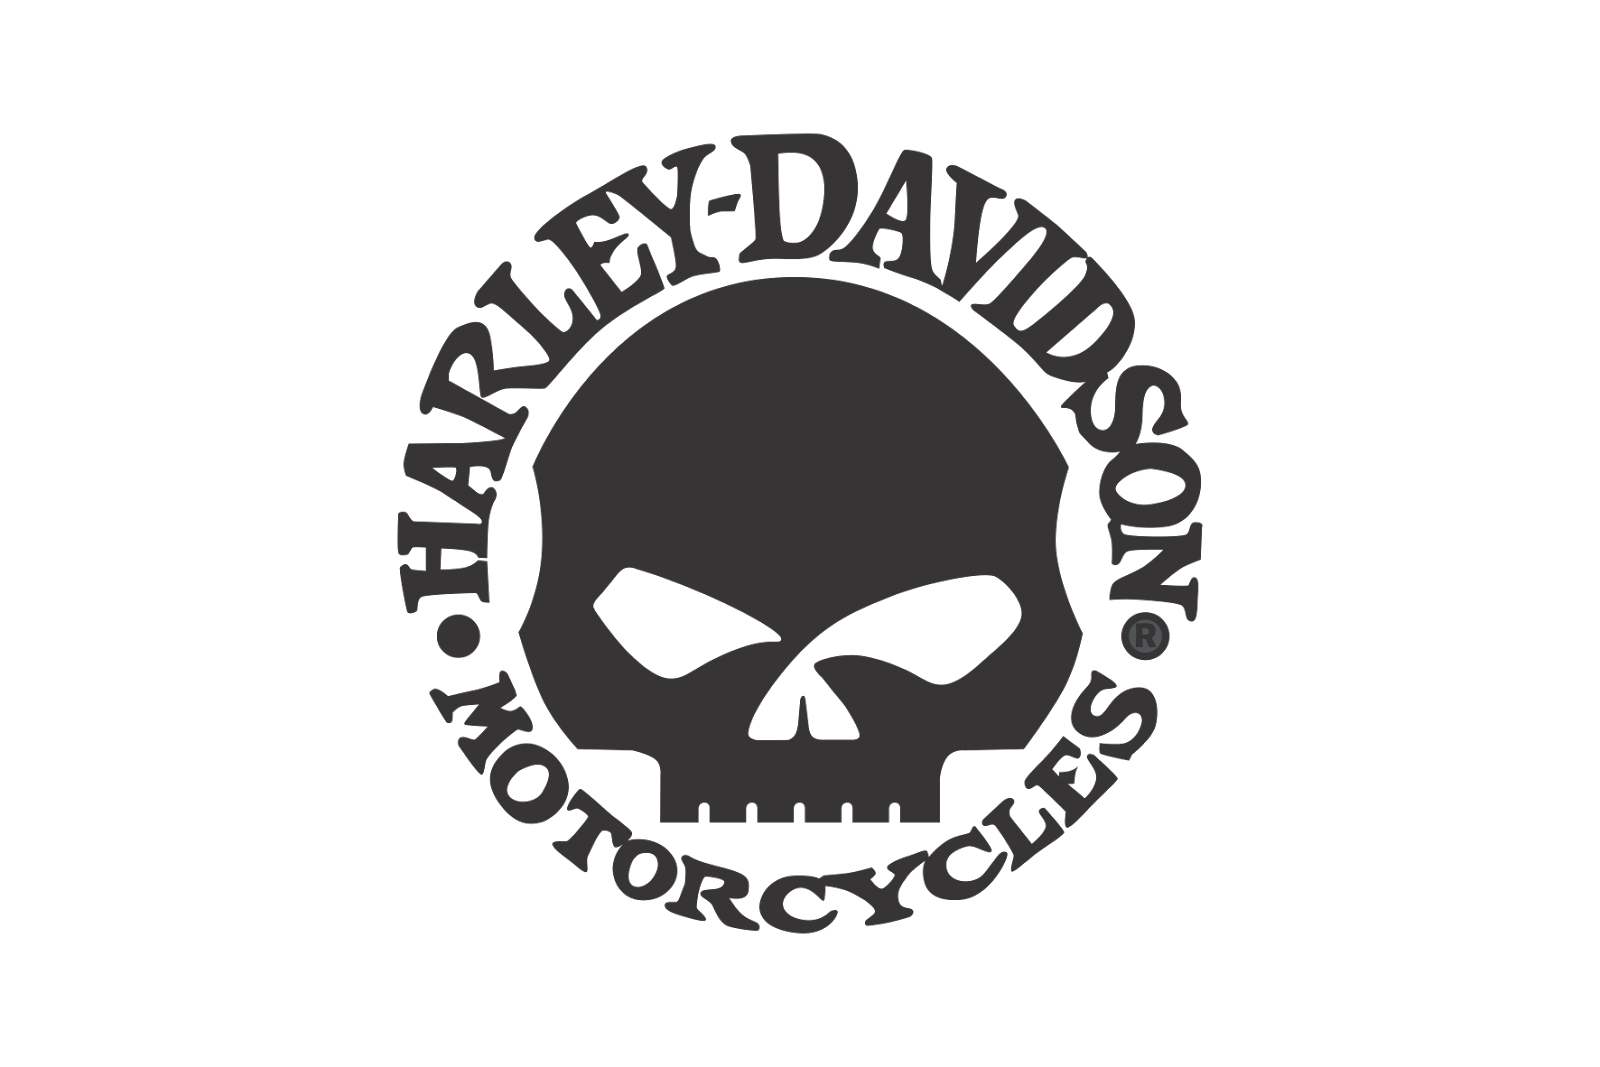 Harley Davidson clipart skull Art on png 3 Vector